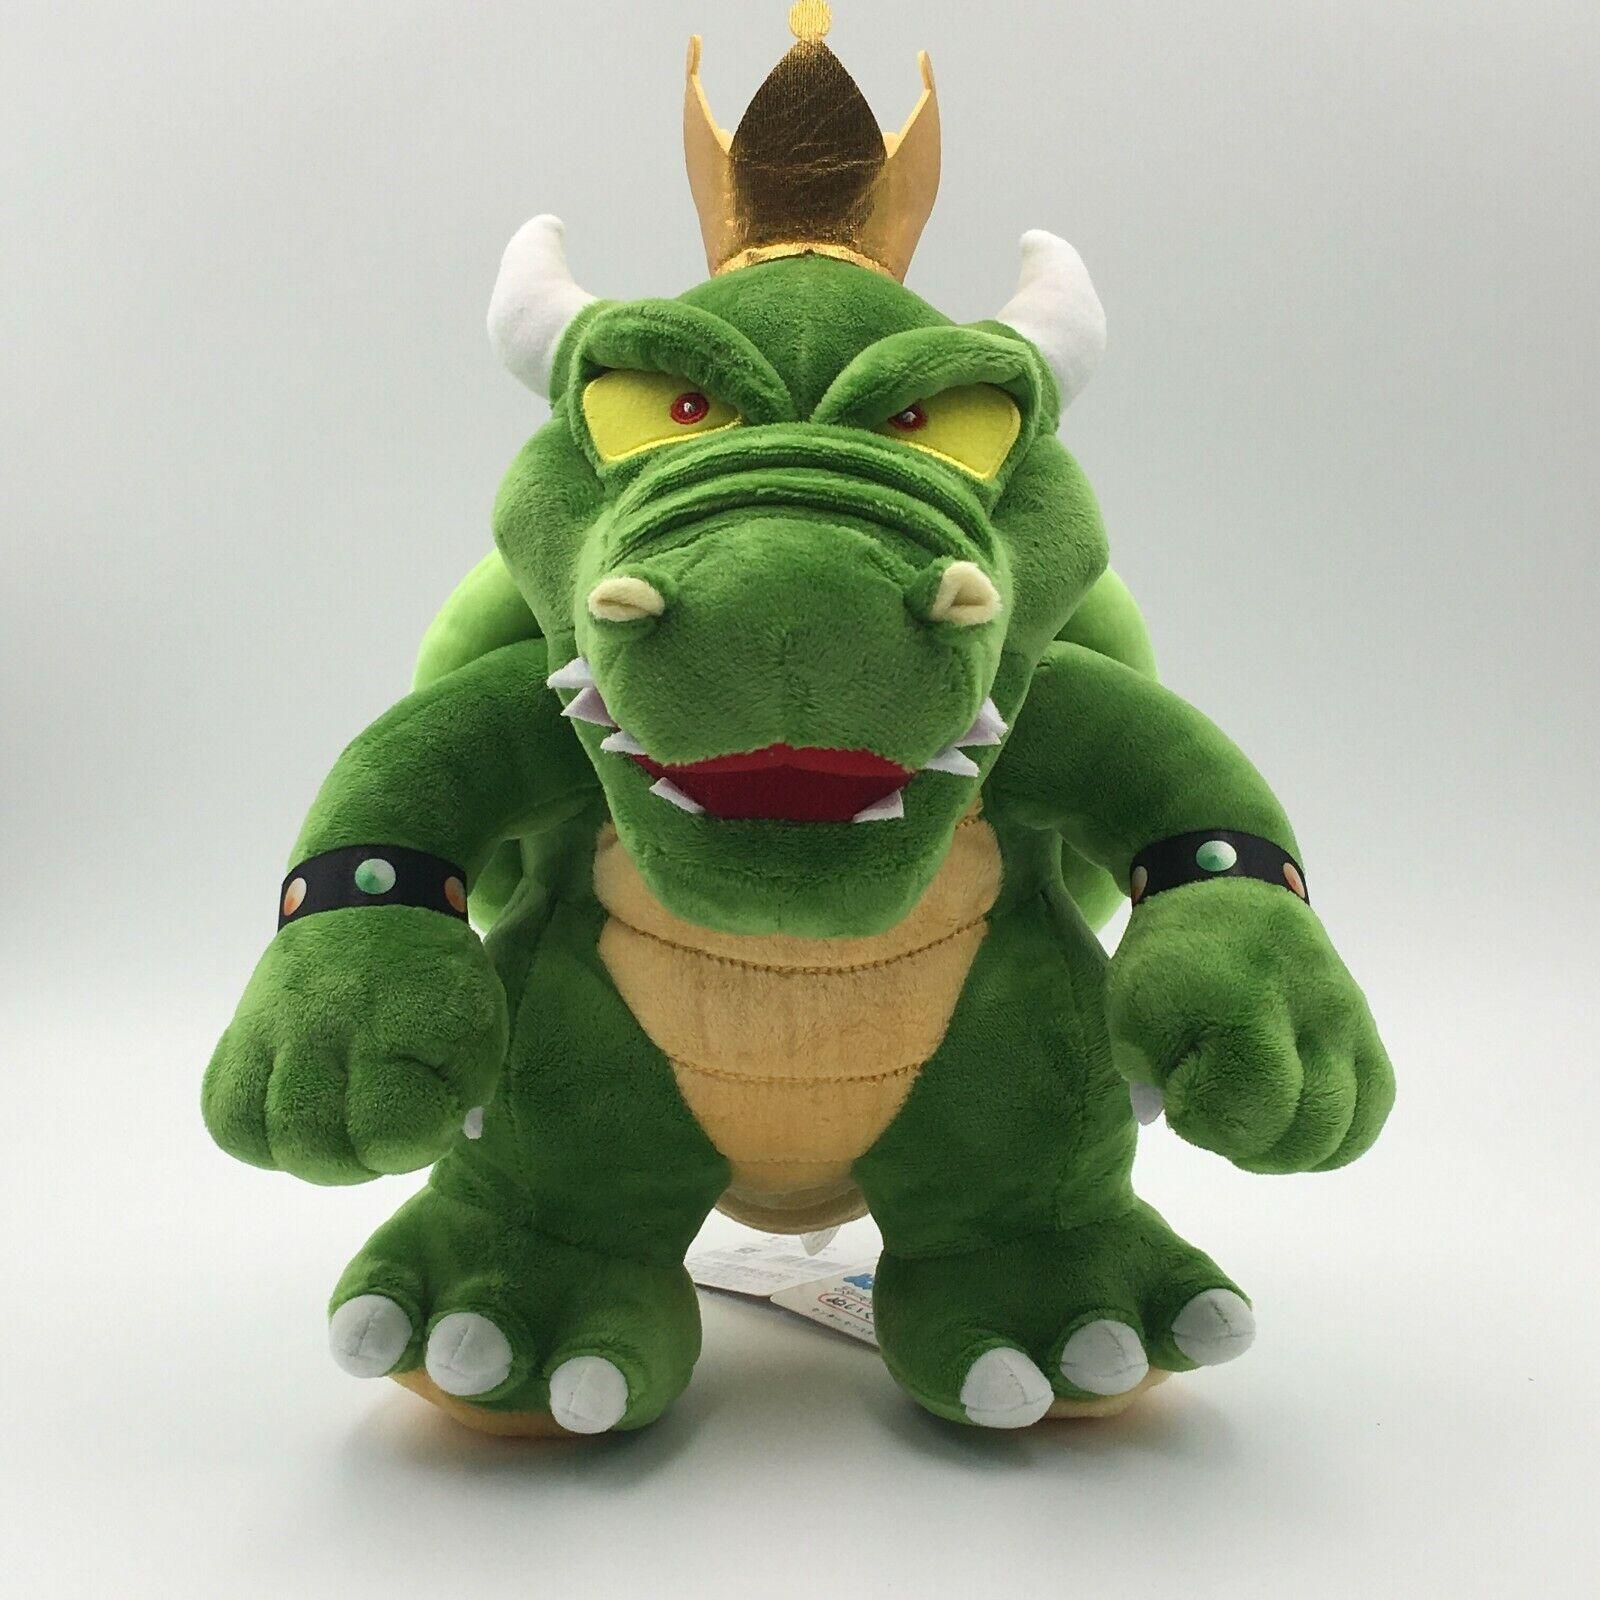 Super Mario King Koopa Bowser Plush Toy Stuffed Animals Doll